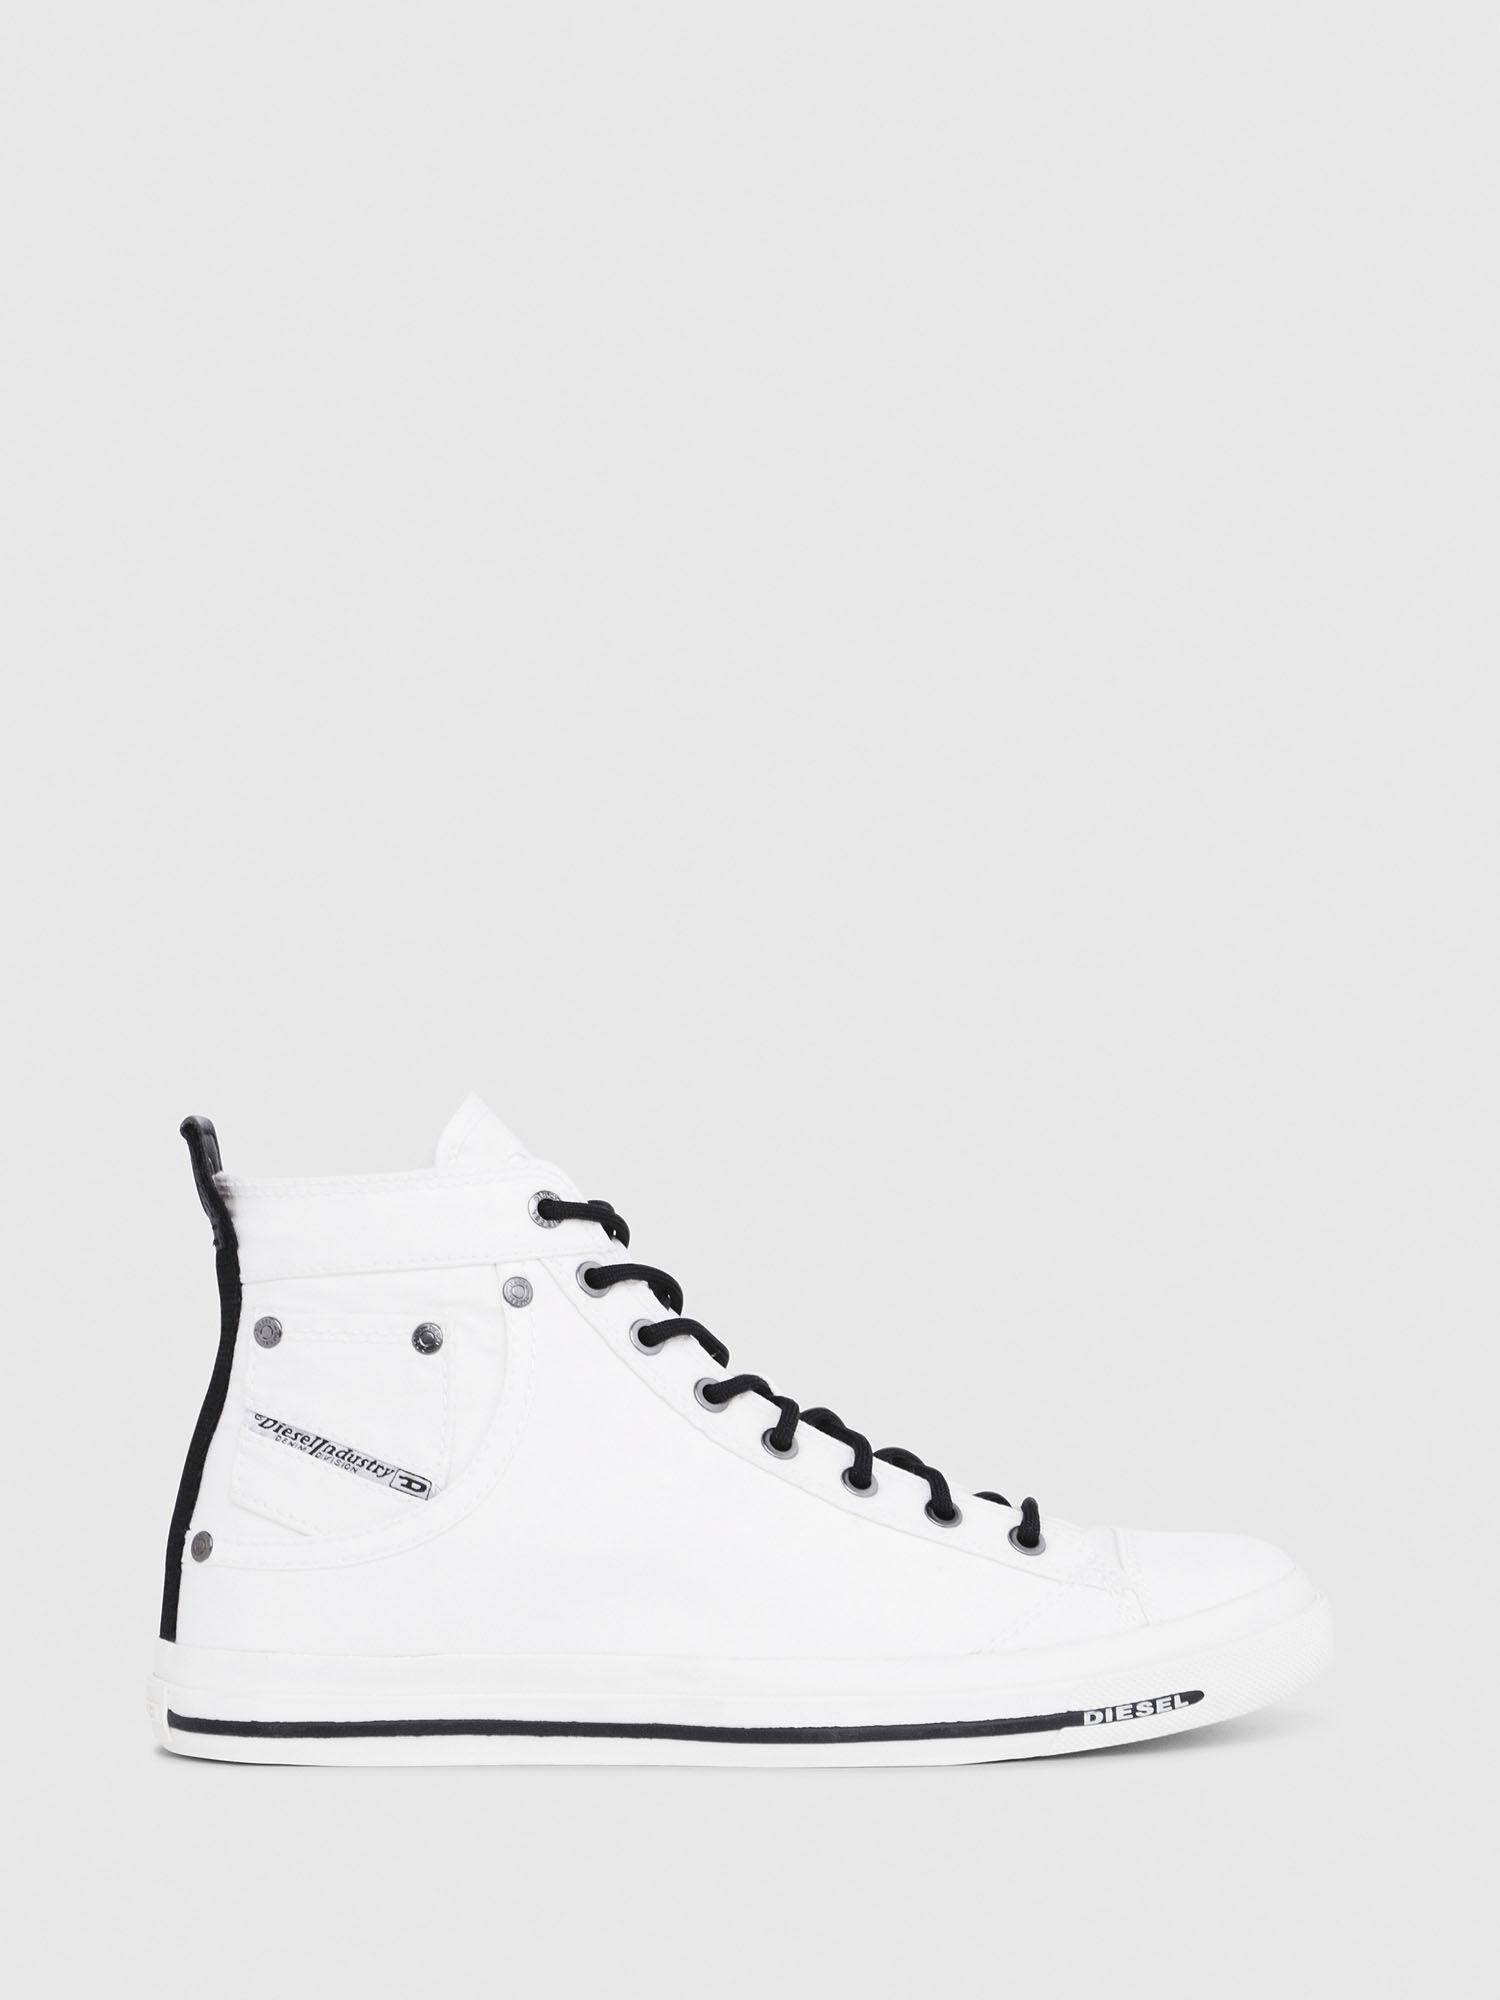 alte in tessuto in Sneaker alte Sneaker Sneaker in tessuto in alte tessuto alte Sneaker 4zSqtxw77